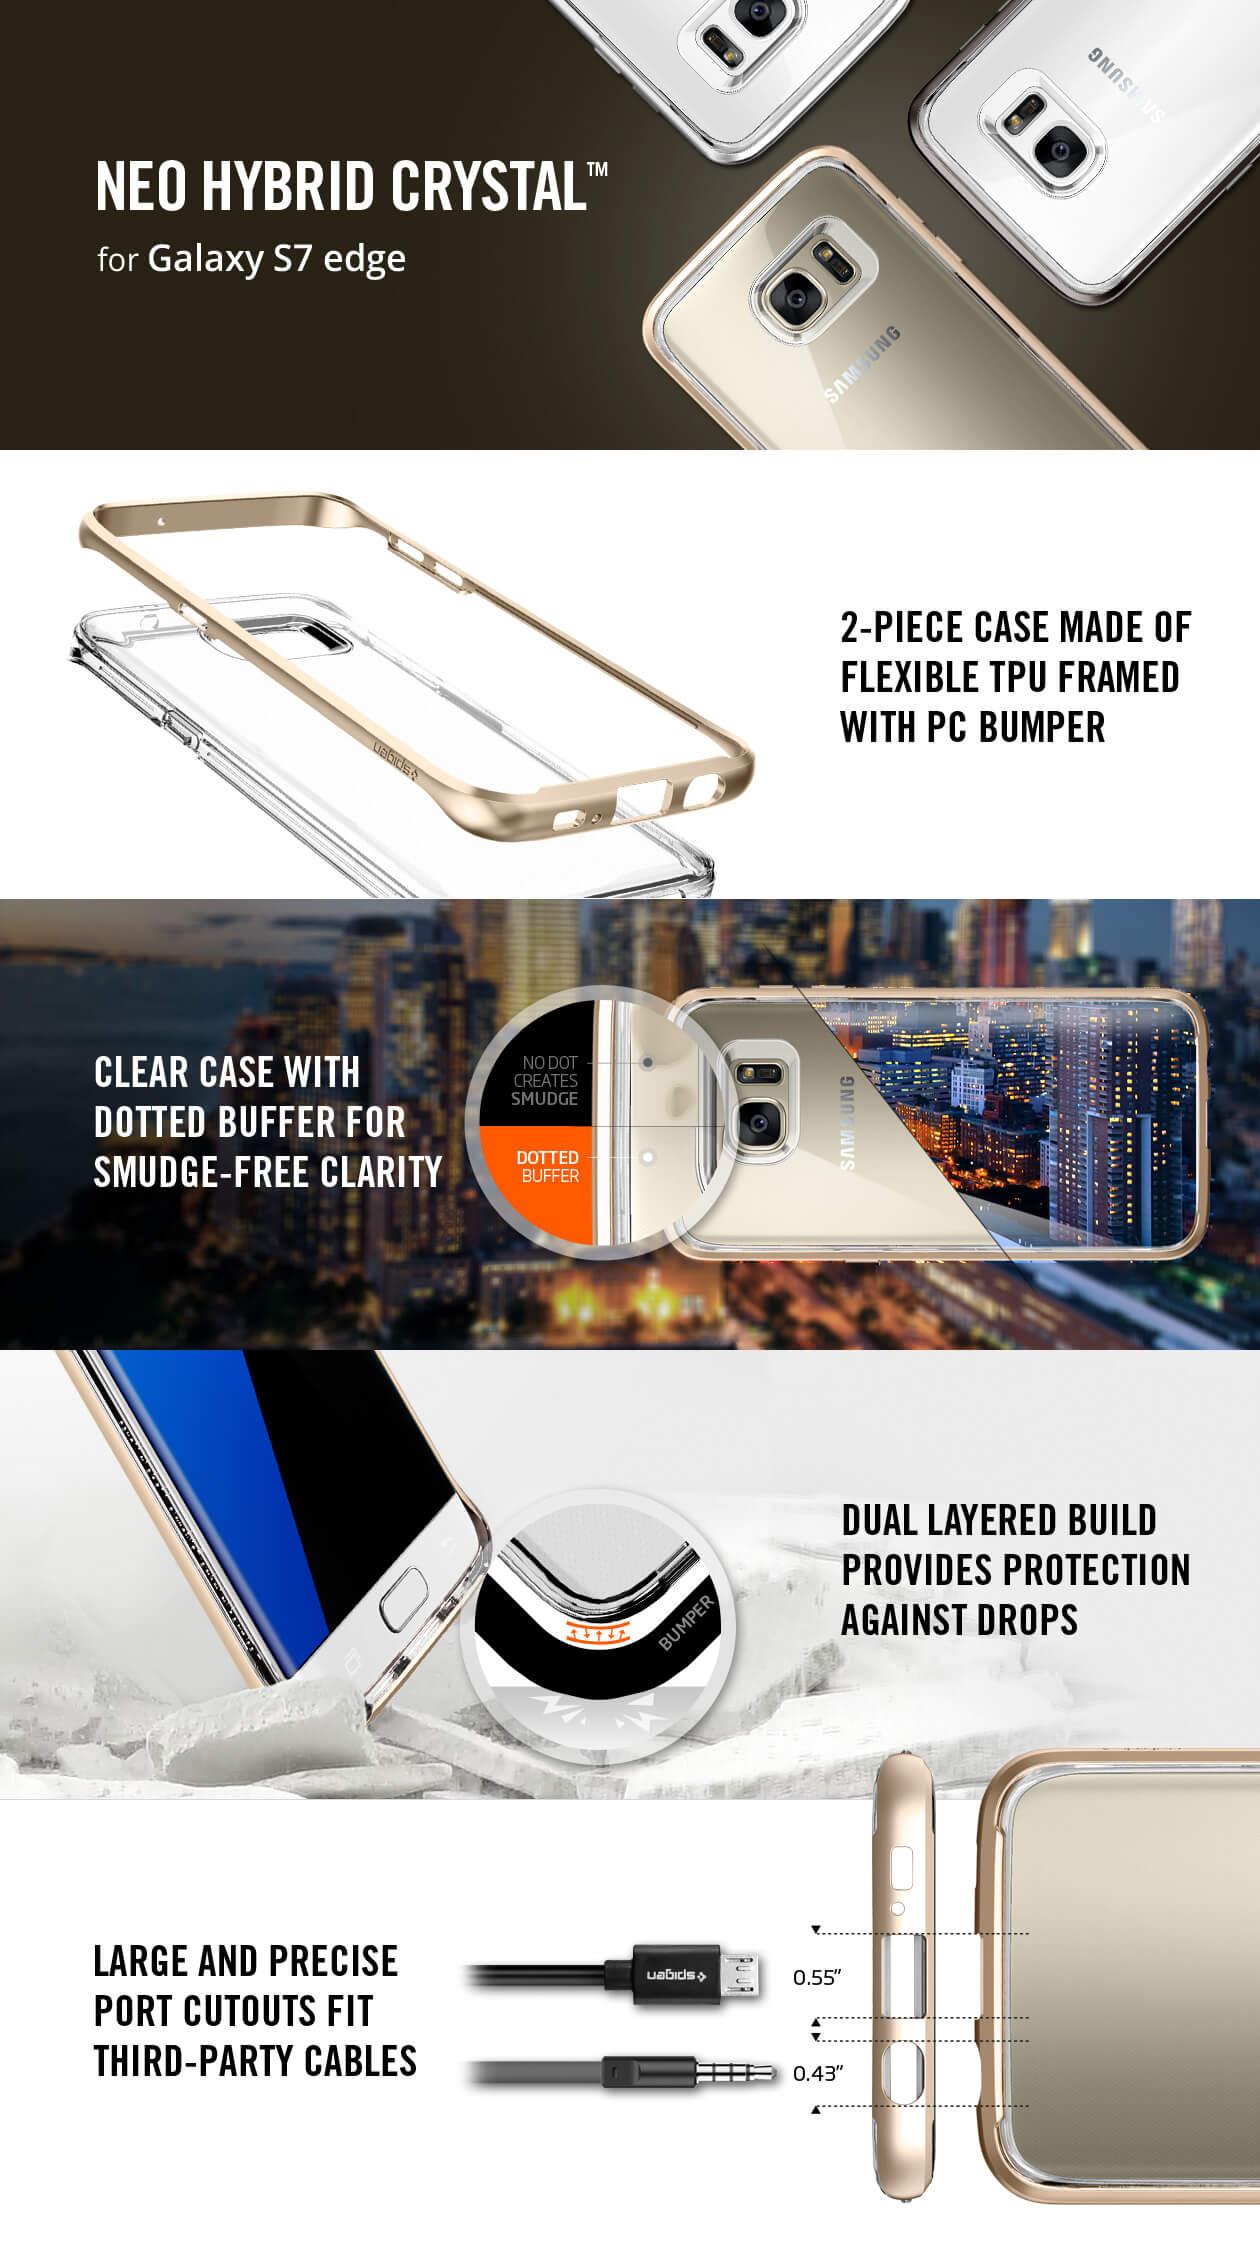 samsung silver nano operating instructions